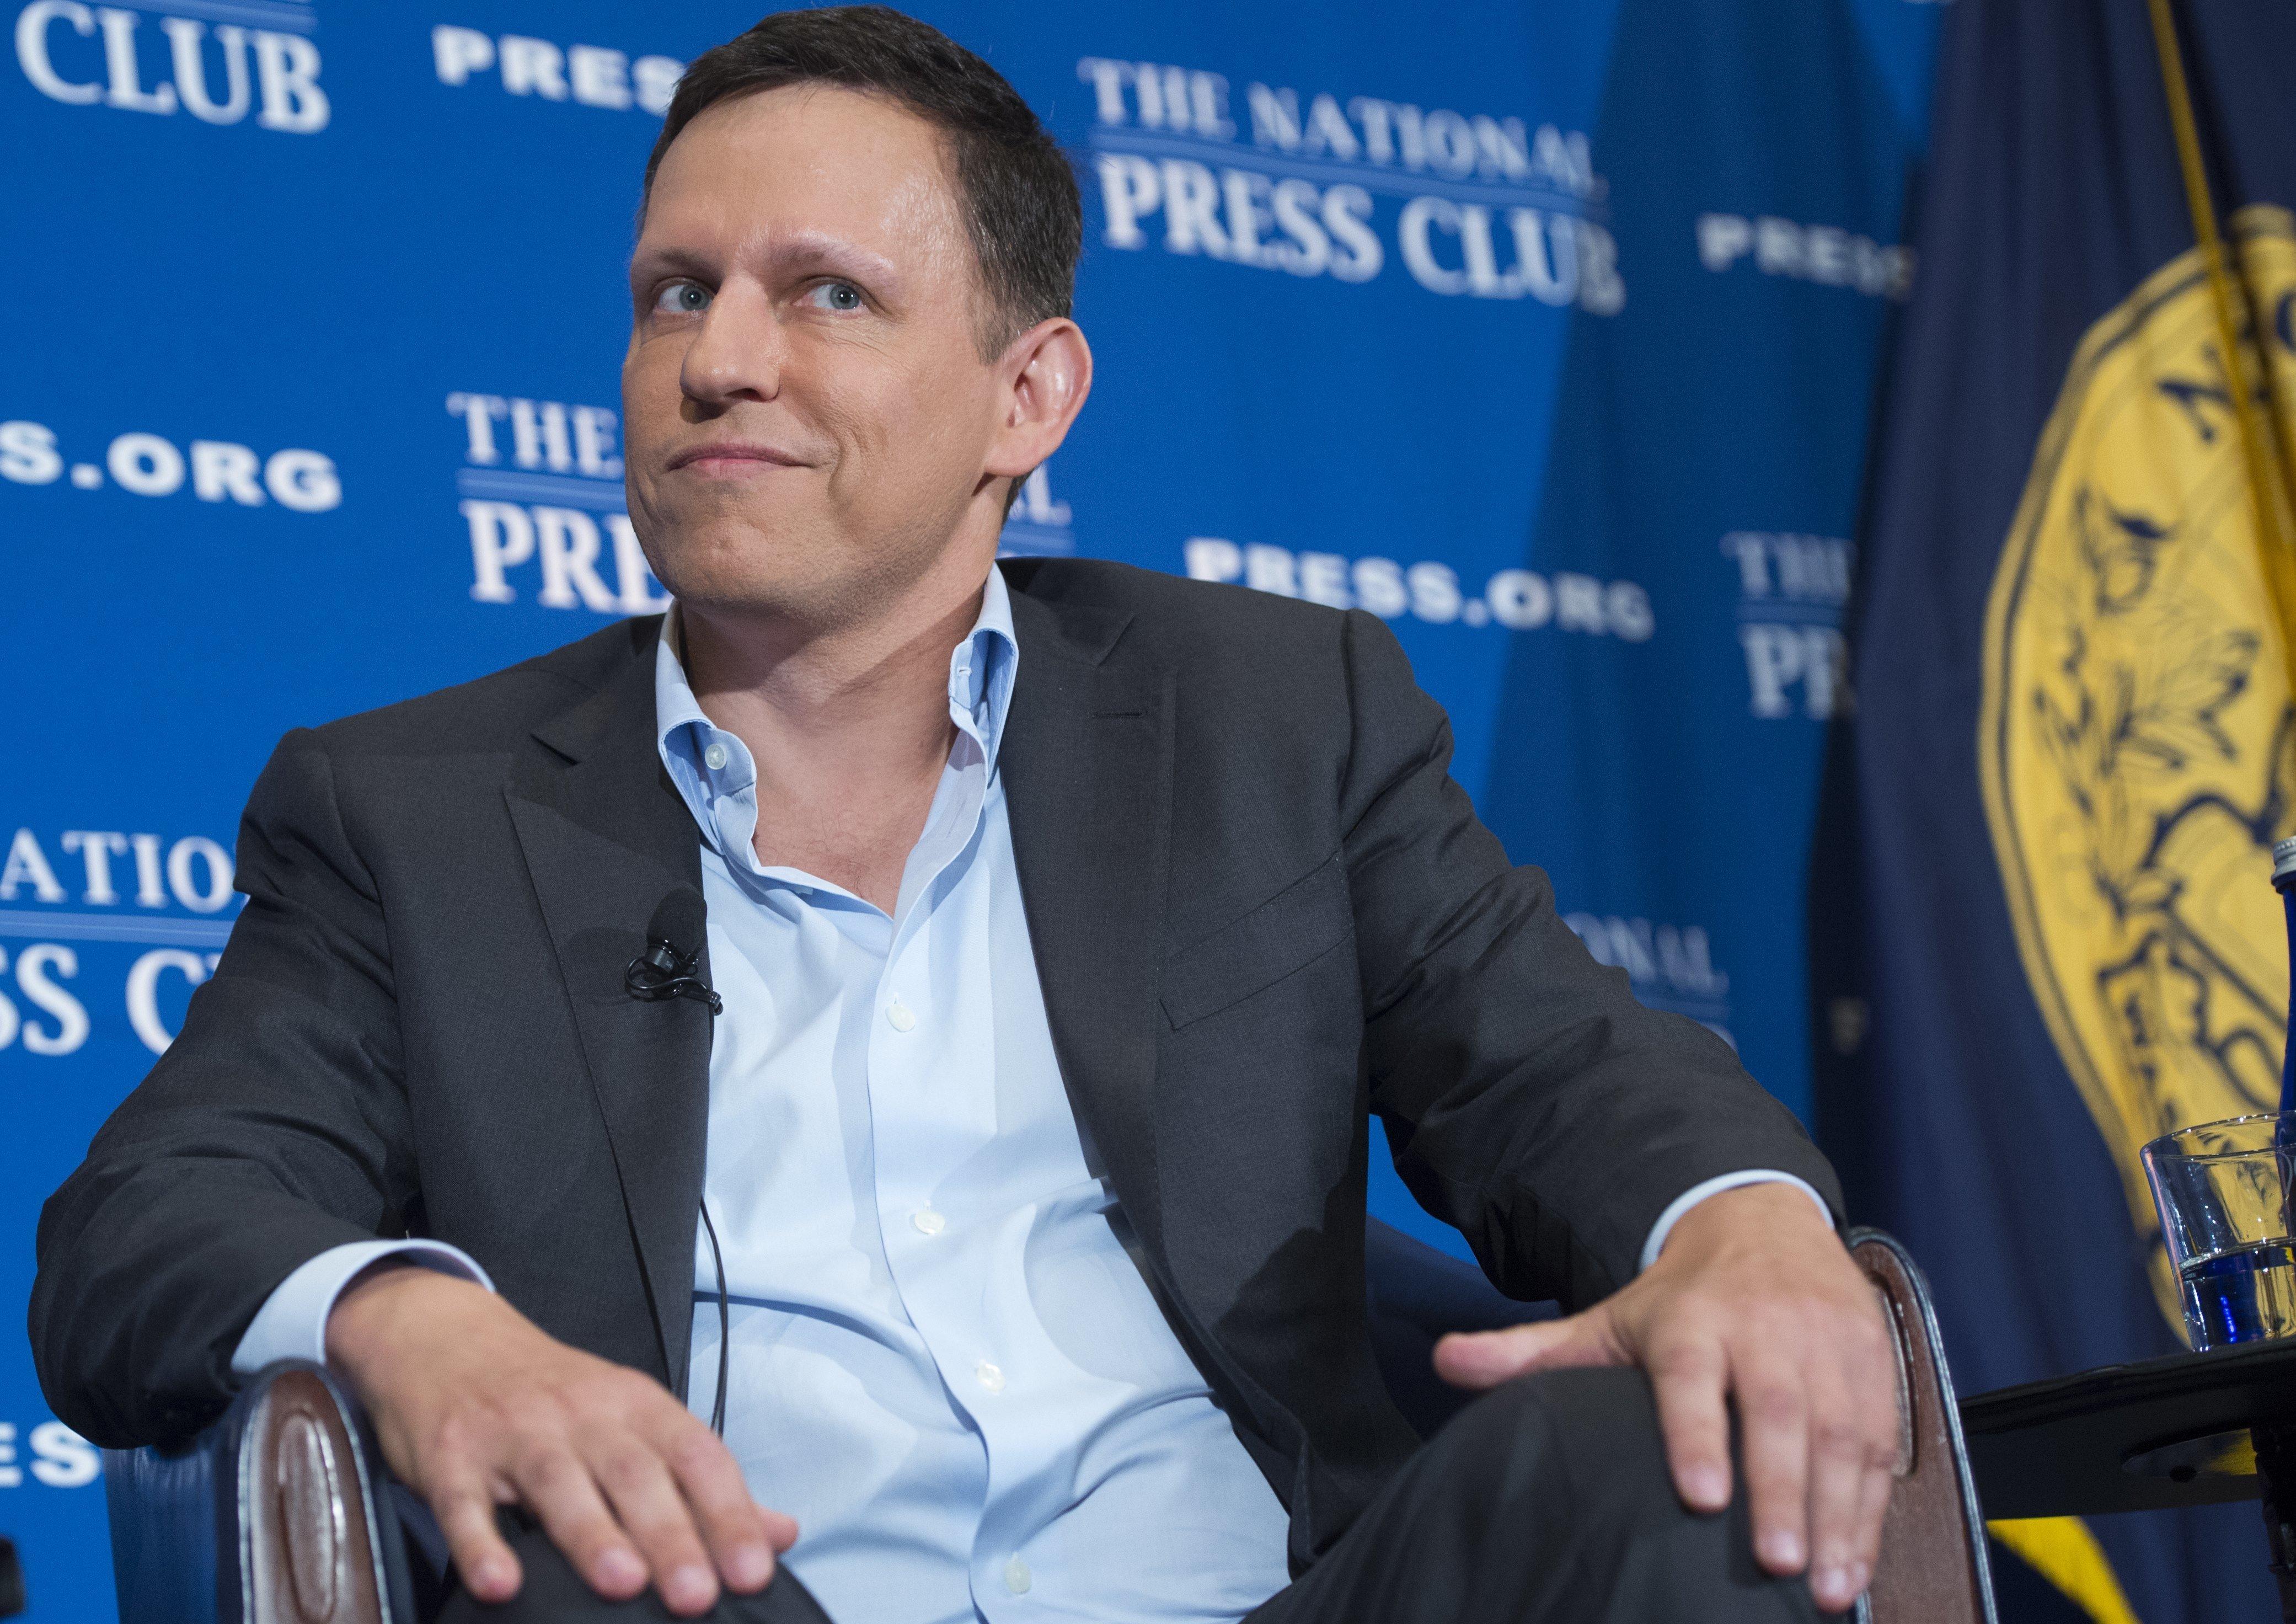 Billionaire Peter Thiel bids for website Gawker he helped shut down